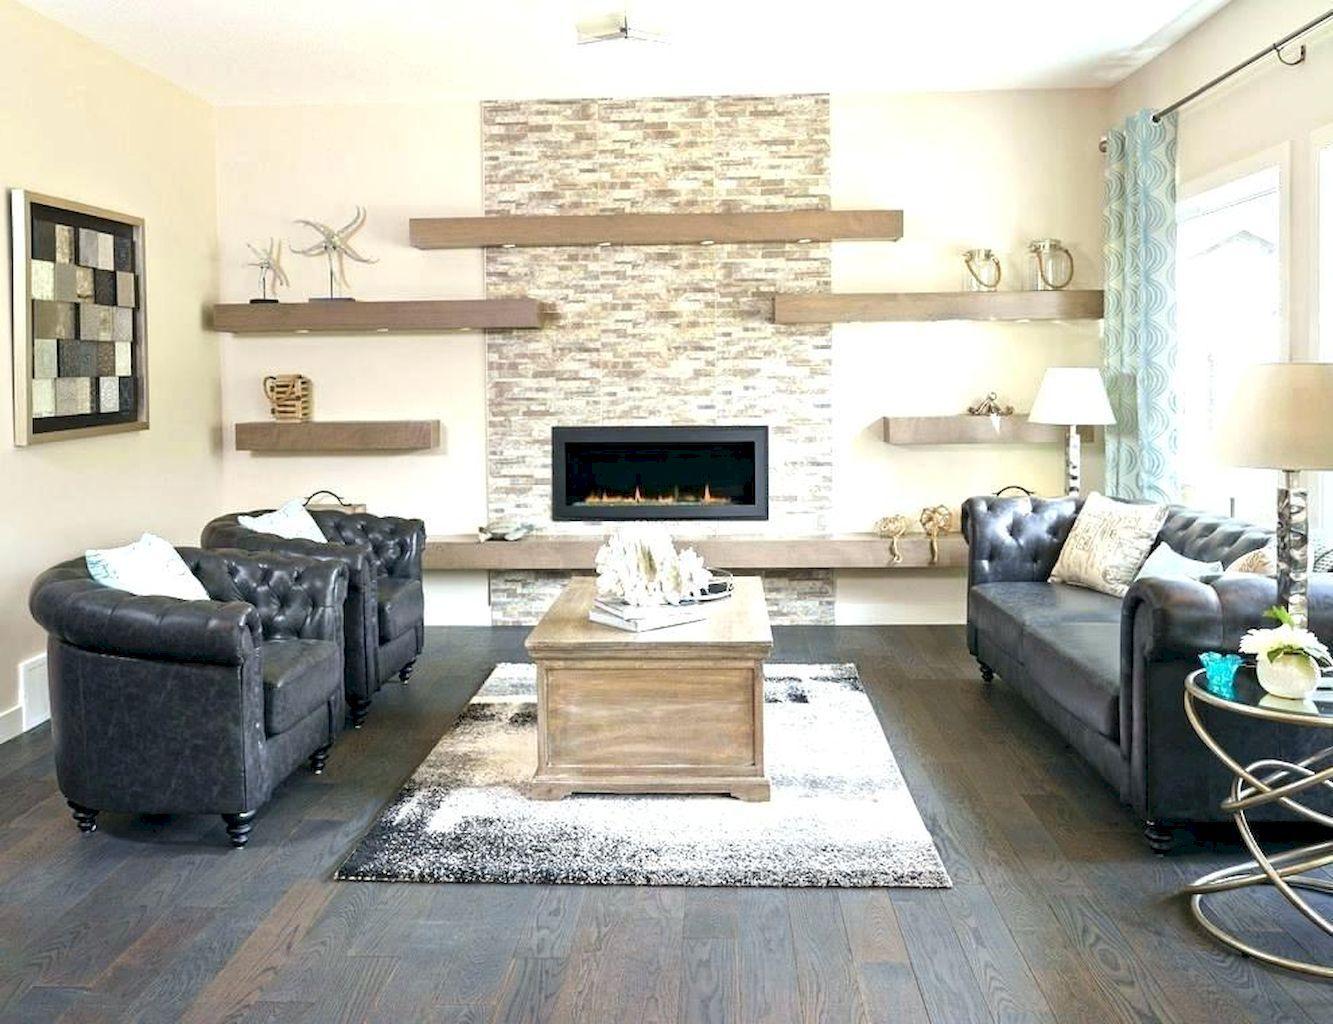 55 Brilliant Floating Shelves Design For Living Room I